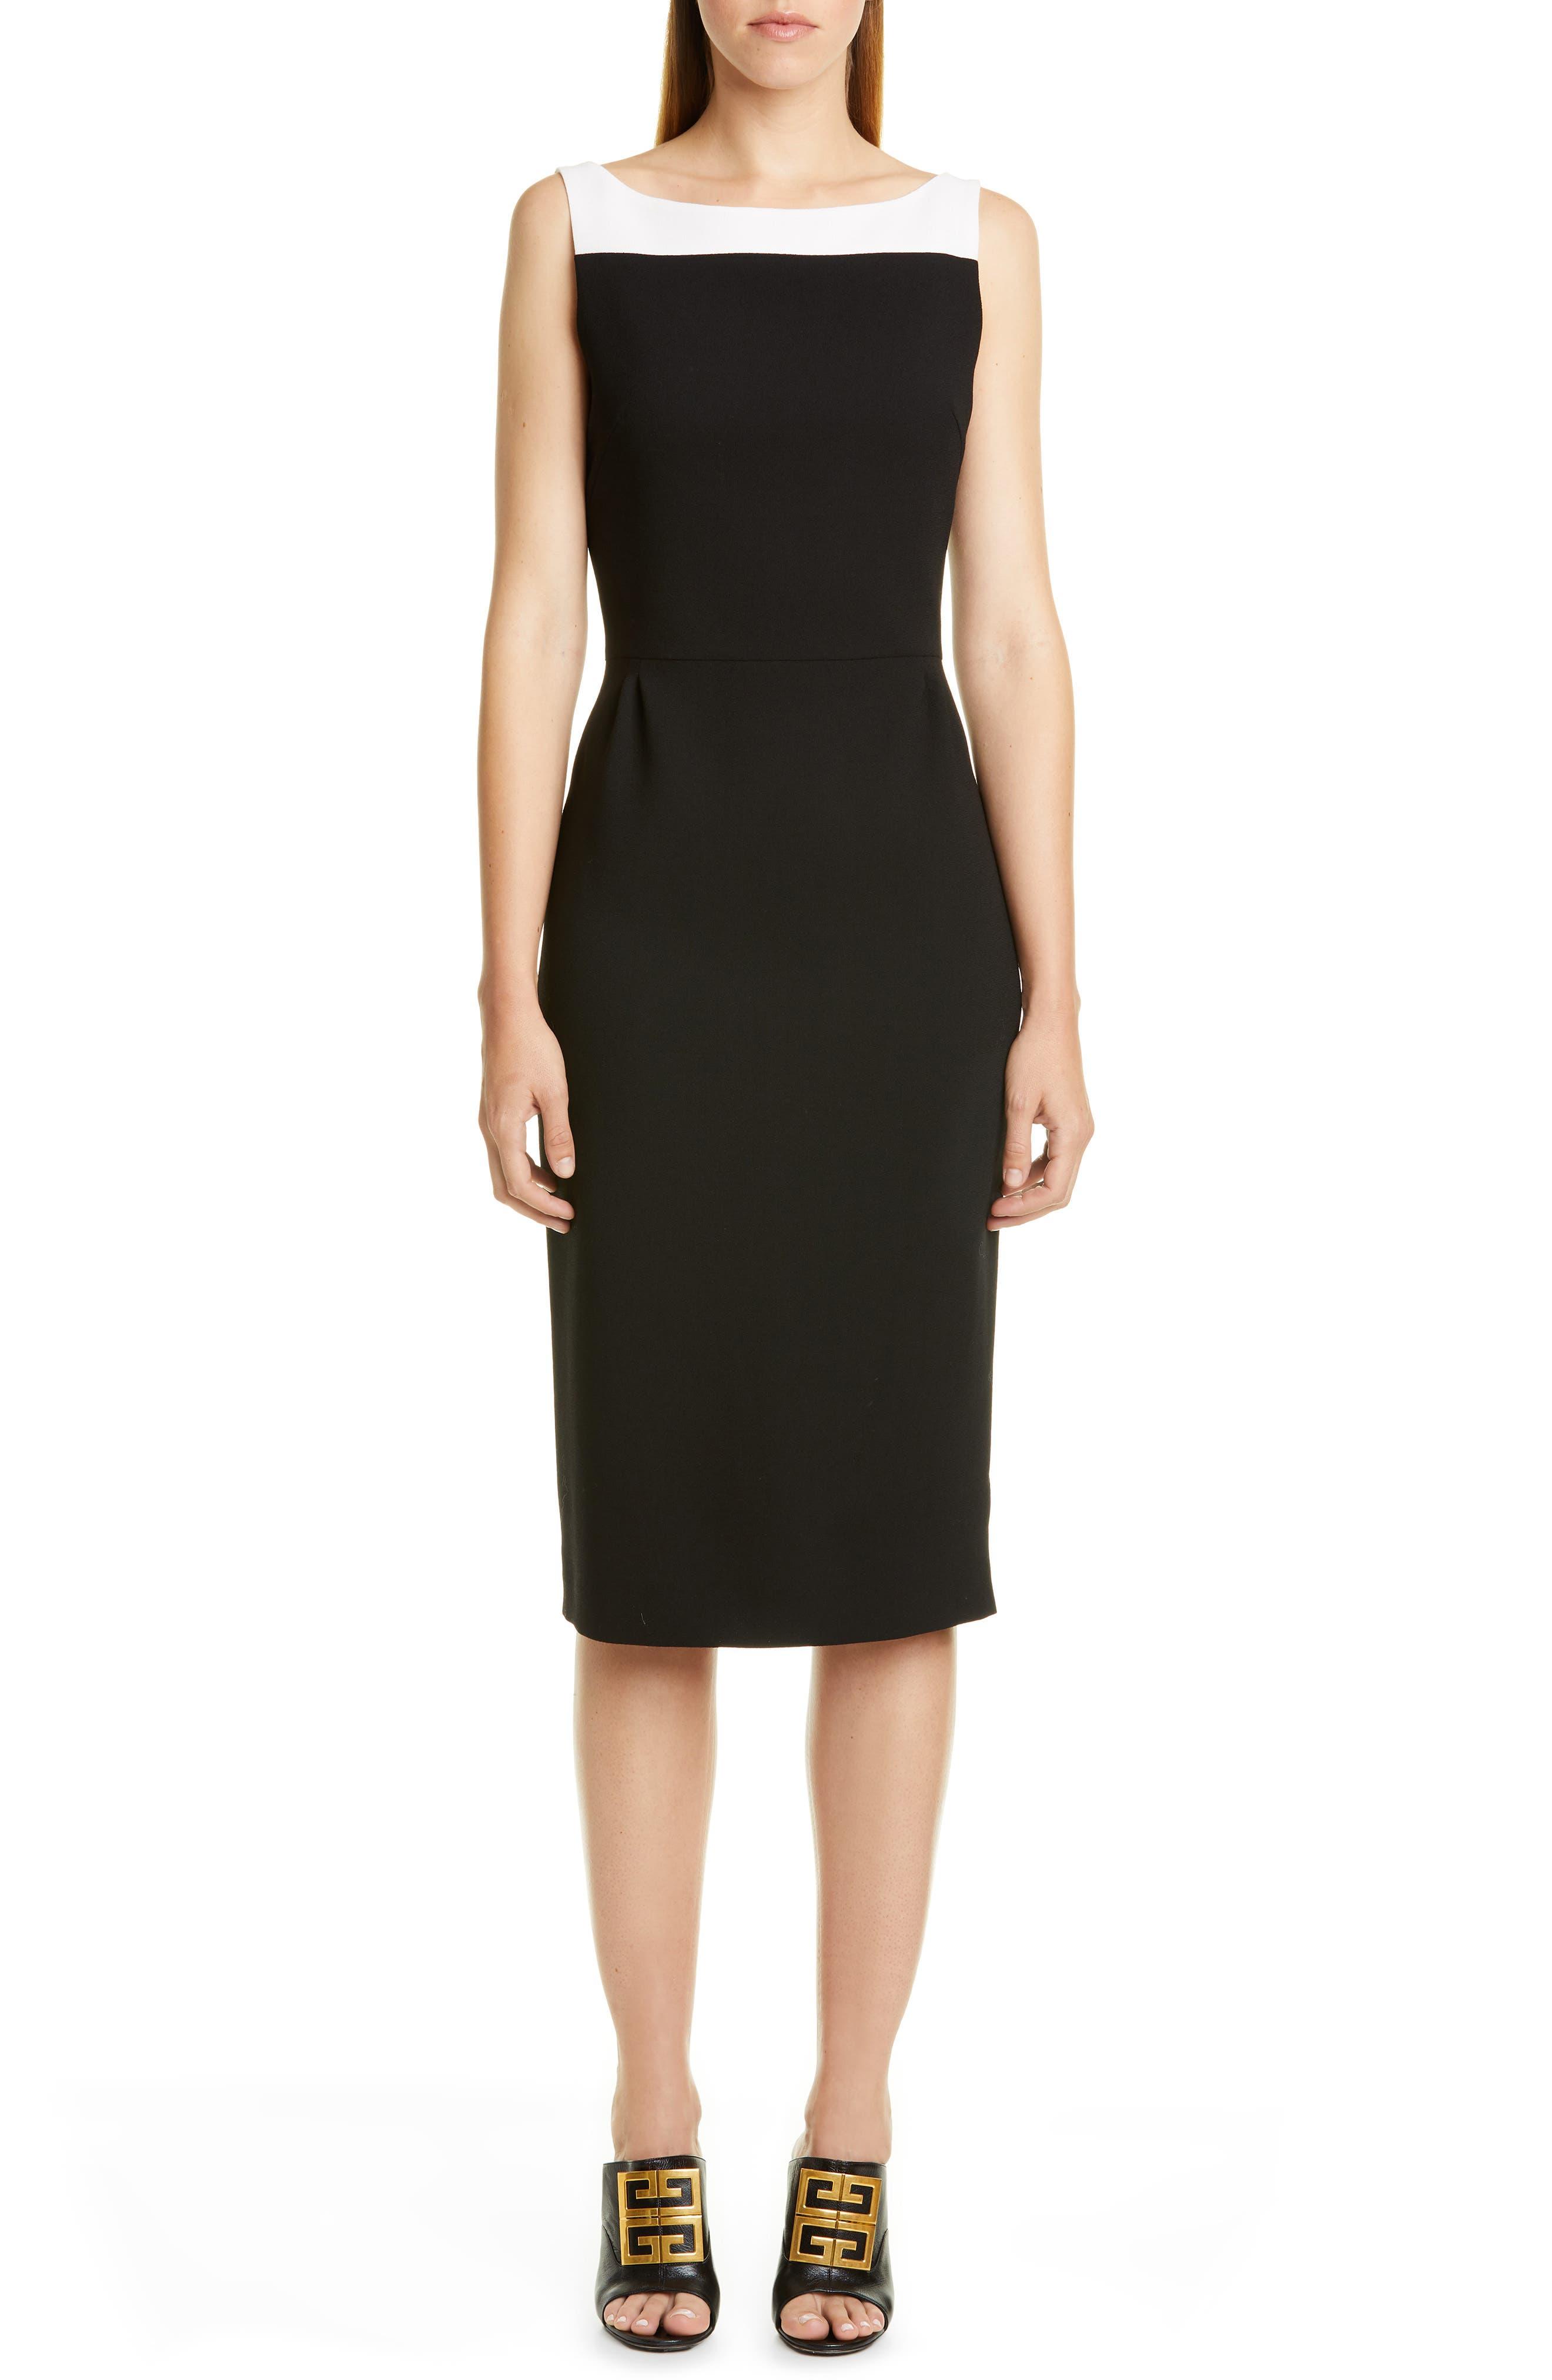 Givenchy Megan Bicolor Wool Midi Dress, 8 FR - Black